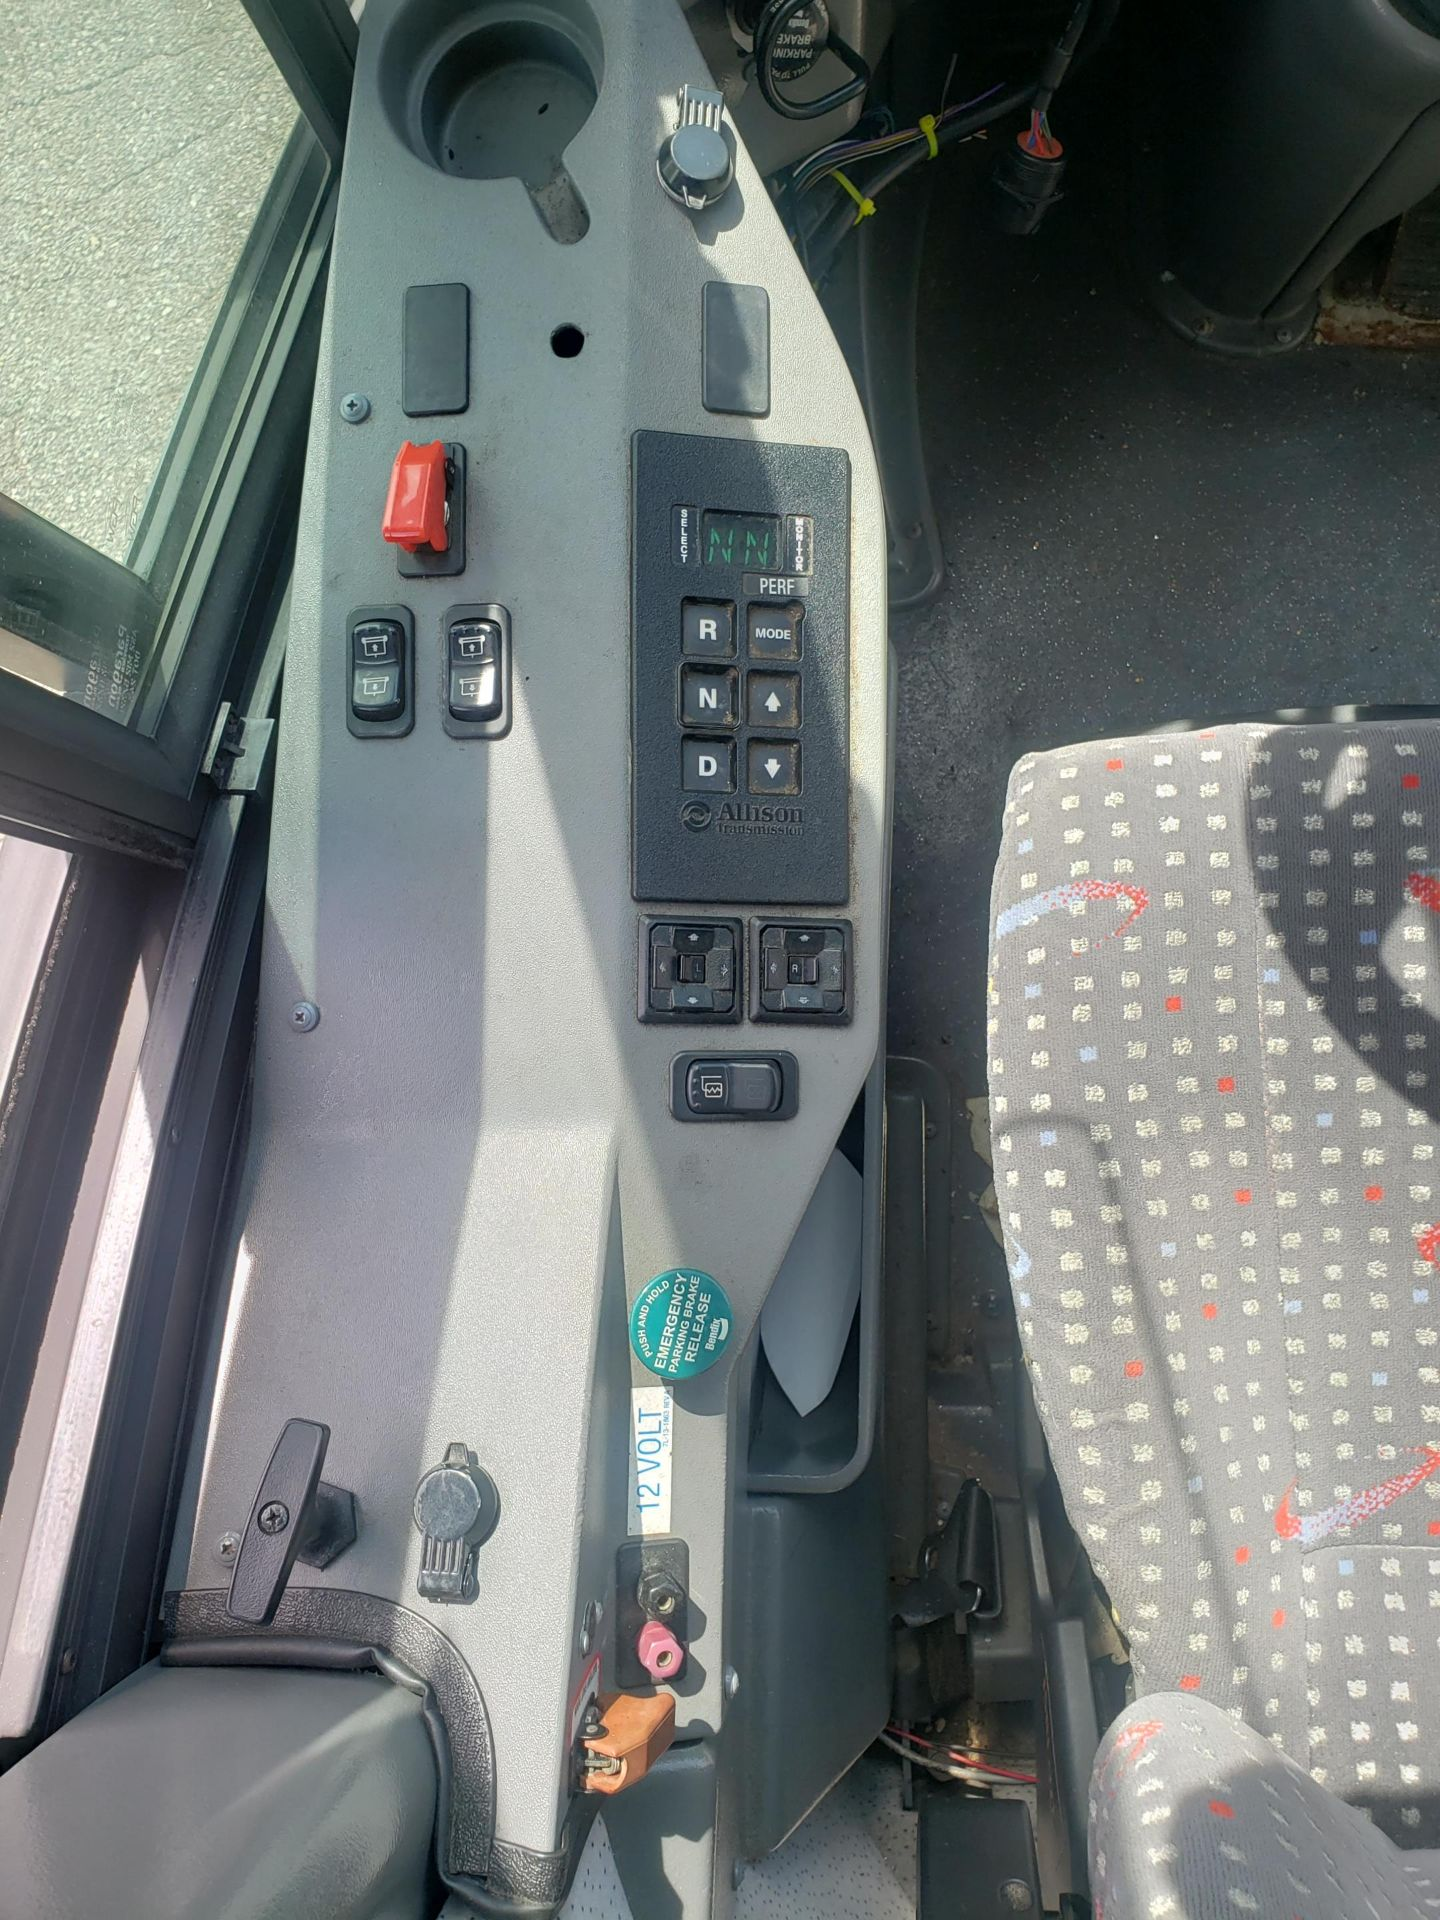 2010 MCI J4500 56-Pass Kneeling Coach Bus - Image 6 of 16